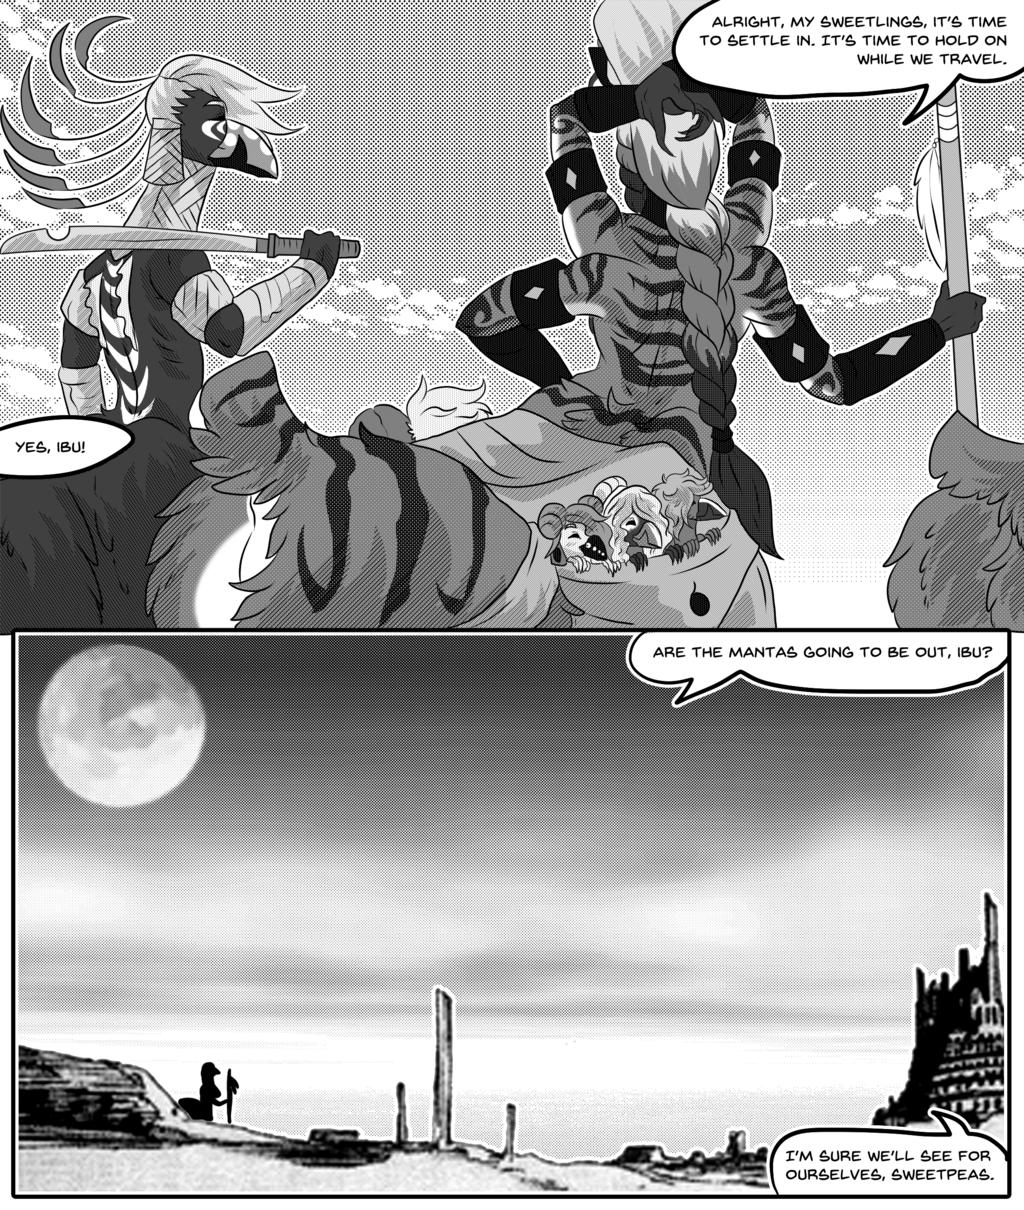 Calti-vating Mystique, Page 4